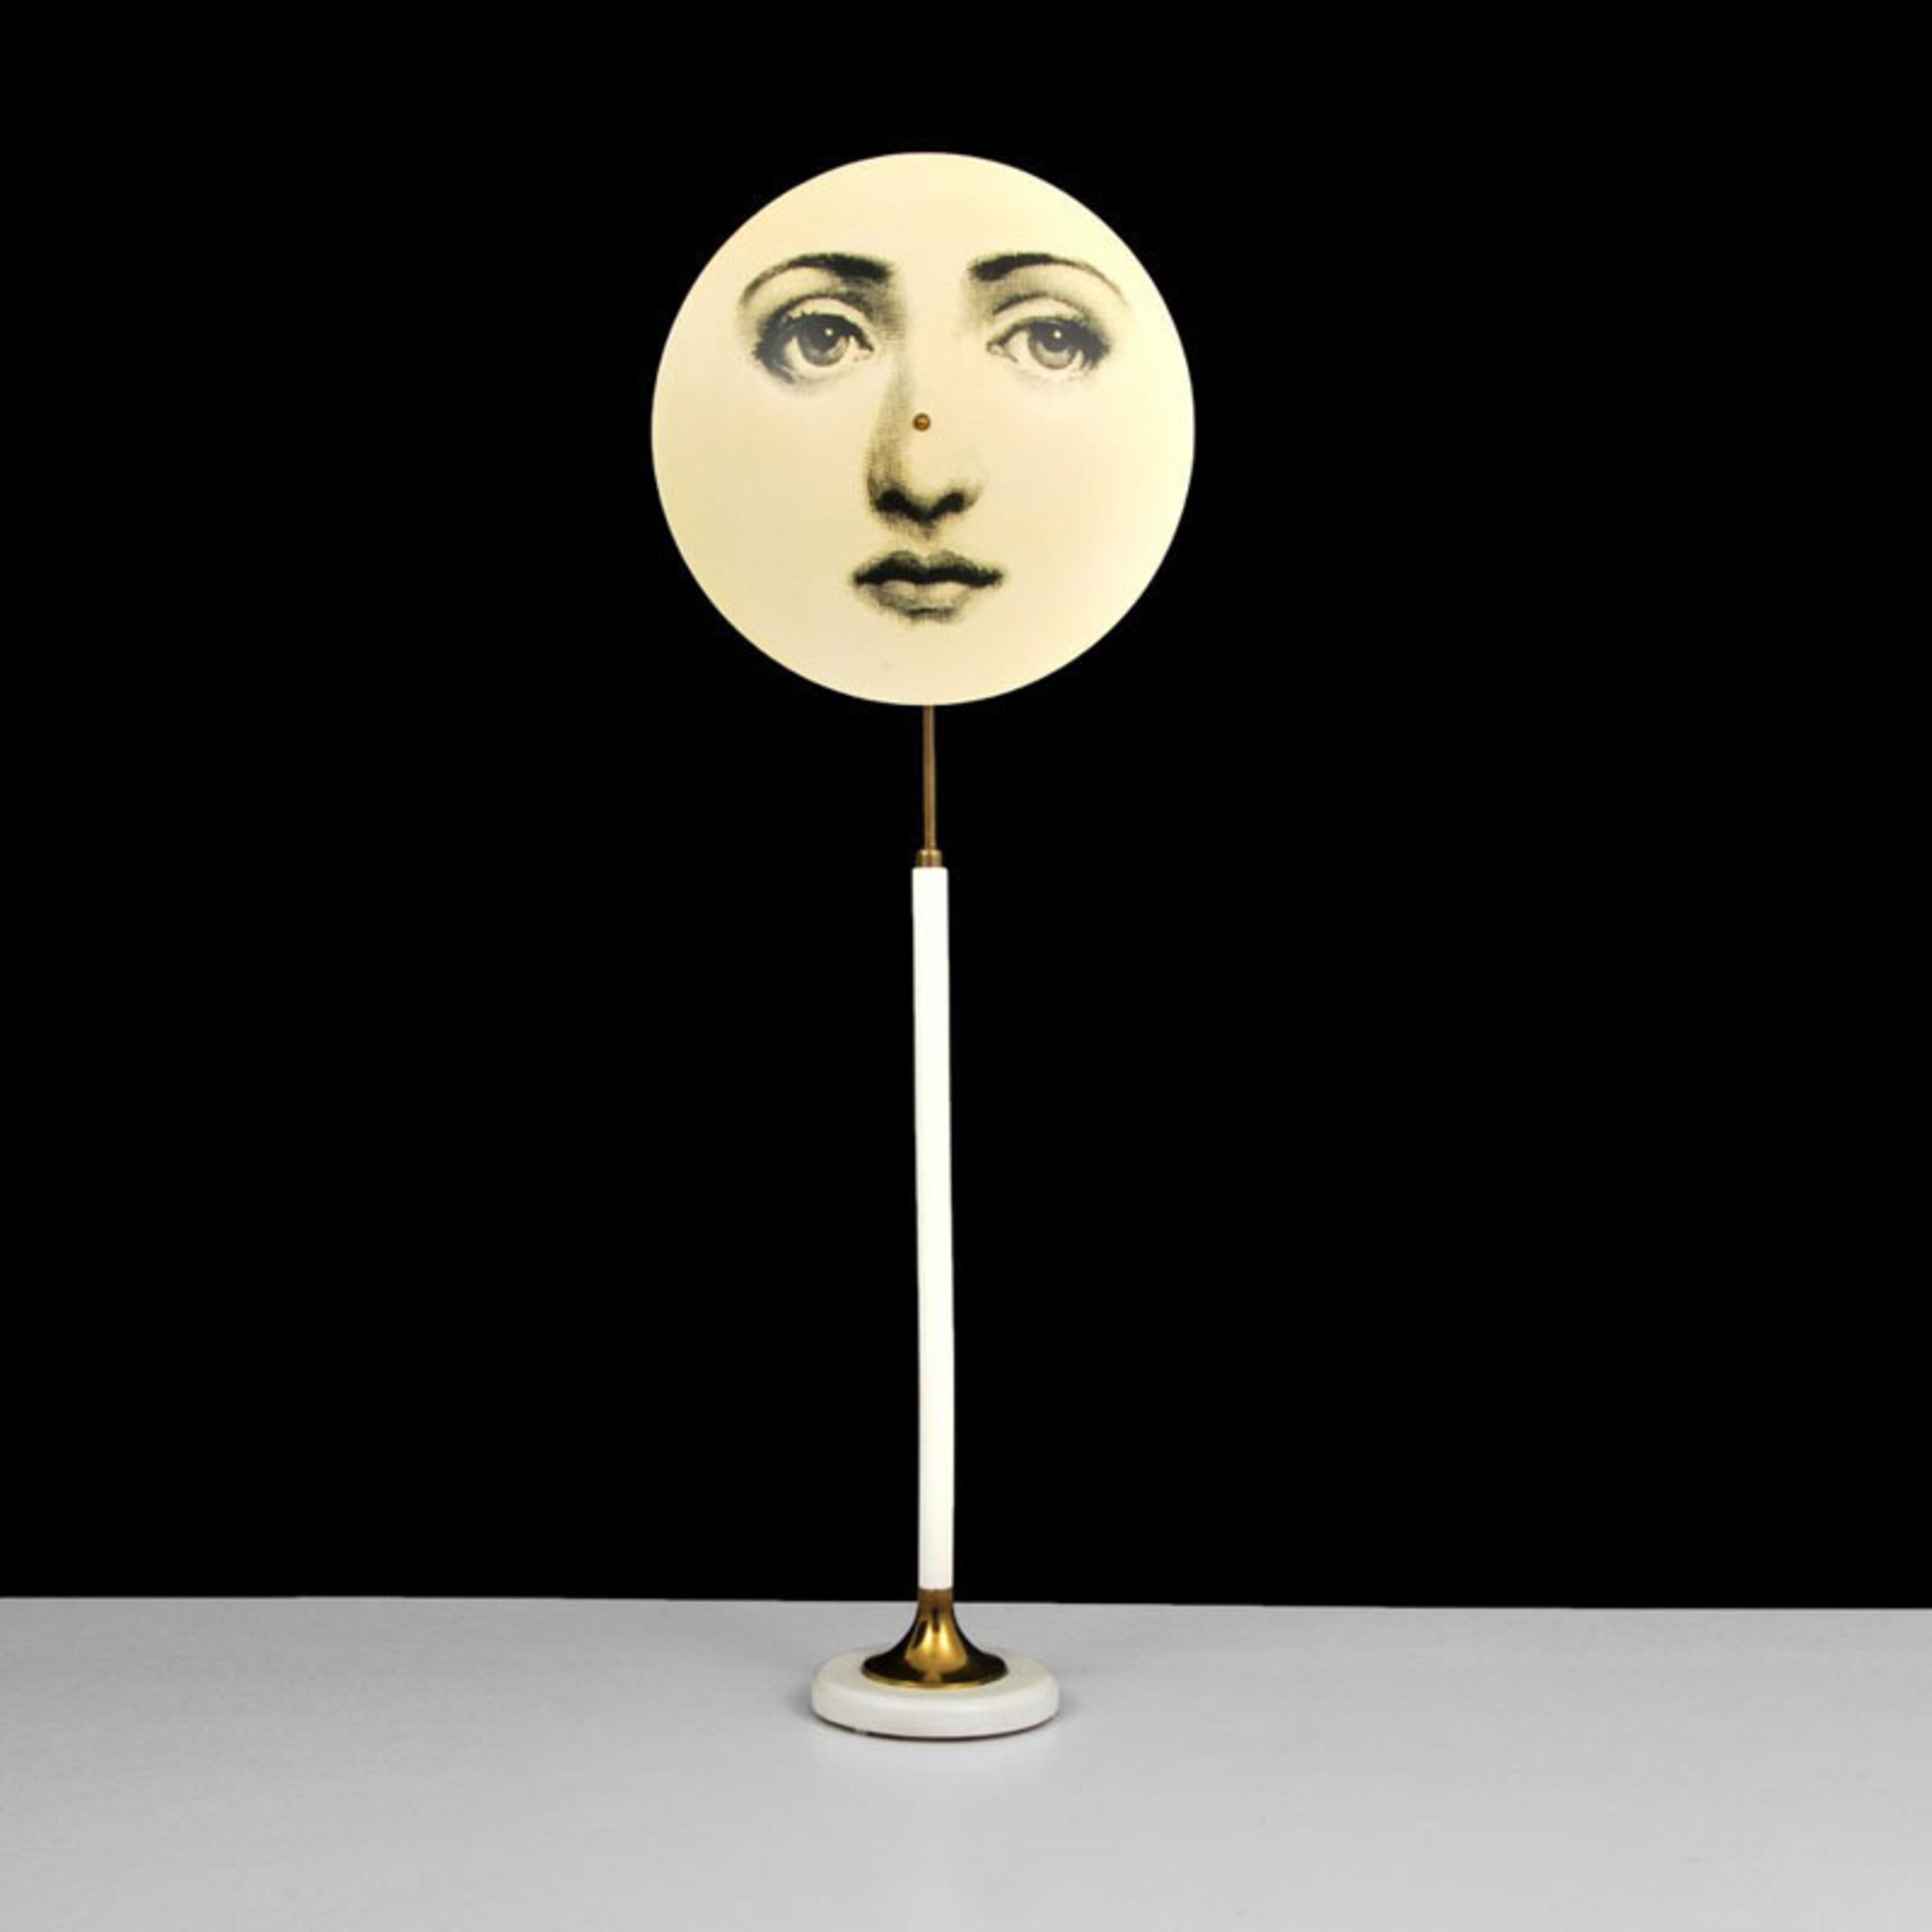 Piero Fornasetti (Italian, 1913-1988), lollipop-form graphic floor lamp with face of Italian opera singer Lina Cavalieri, 75in tall. Auction estimate: $10,000-$15,000. Palm Beach Modern Auctions image. (PRNewsFoto/Palm Beach Modern Auctions) (PRNewsFoto/PALM BEACH MODERN AUCTIONS)